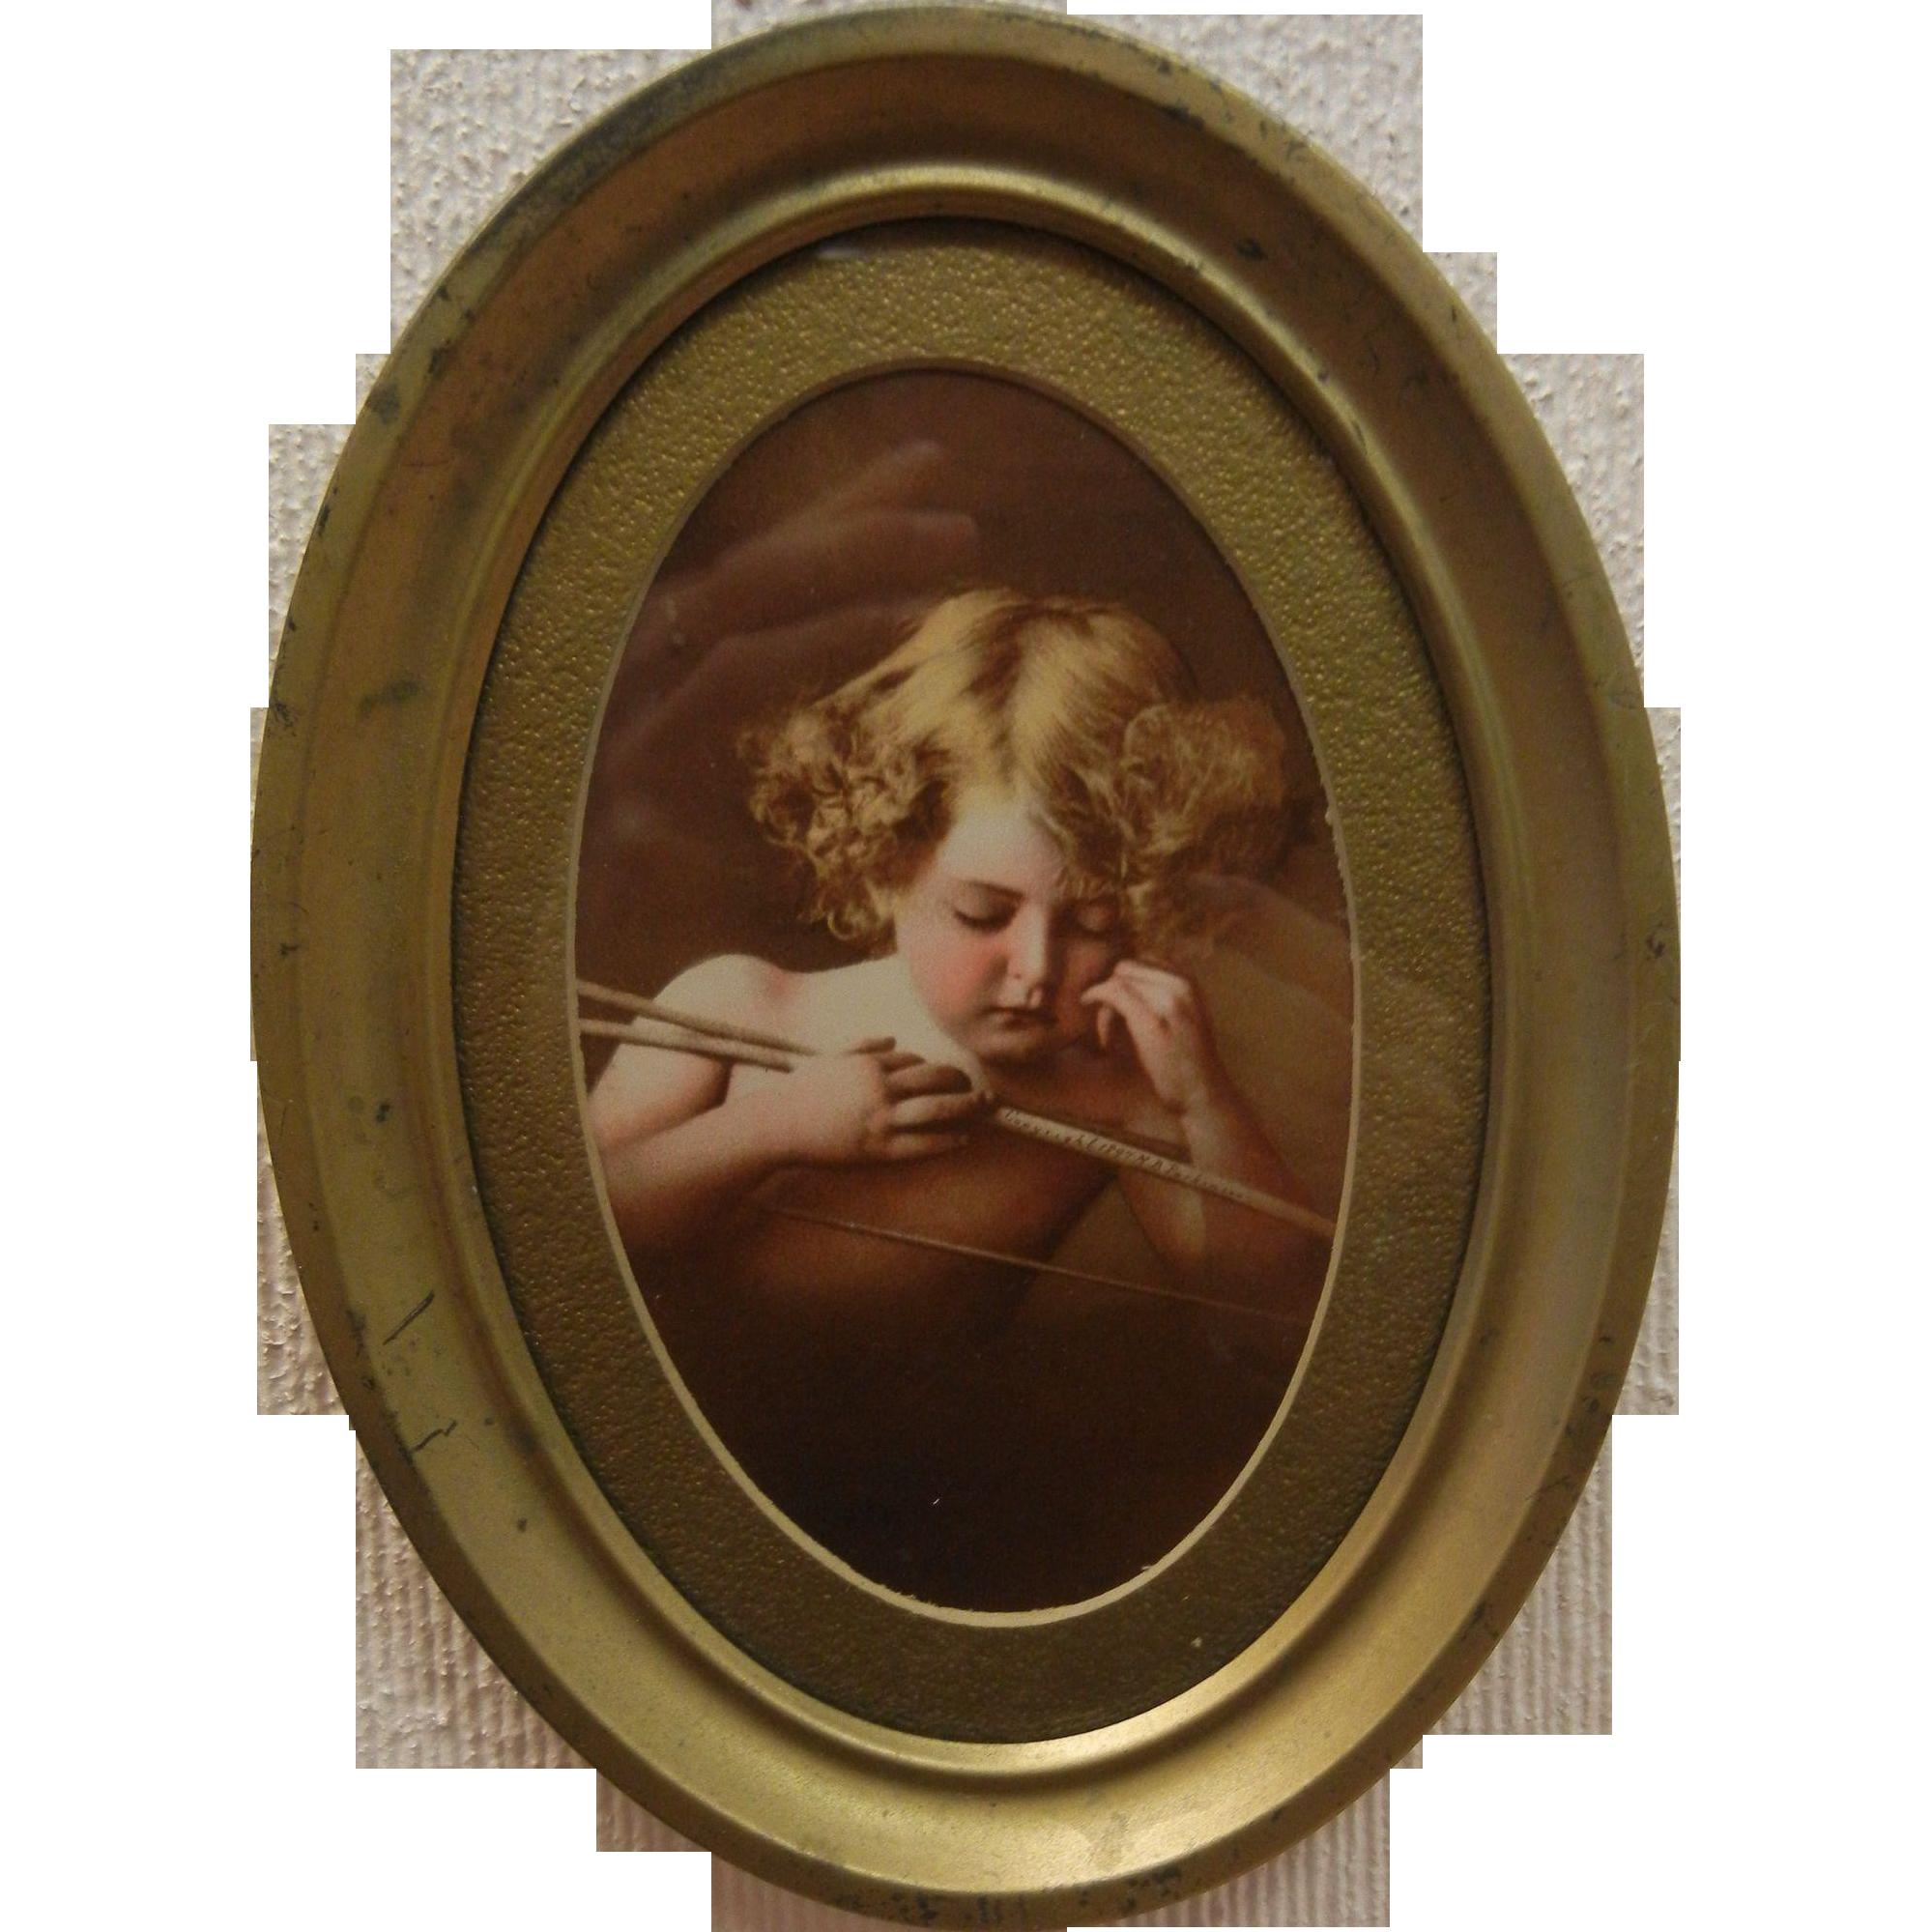 Vintage Blonde Cherub Portrait in Gilded Oval Frame by Jury-Rowe Co